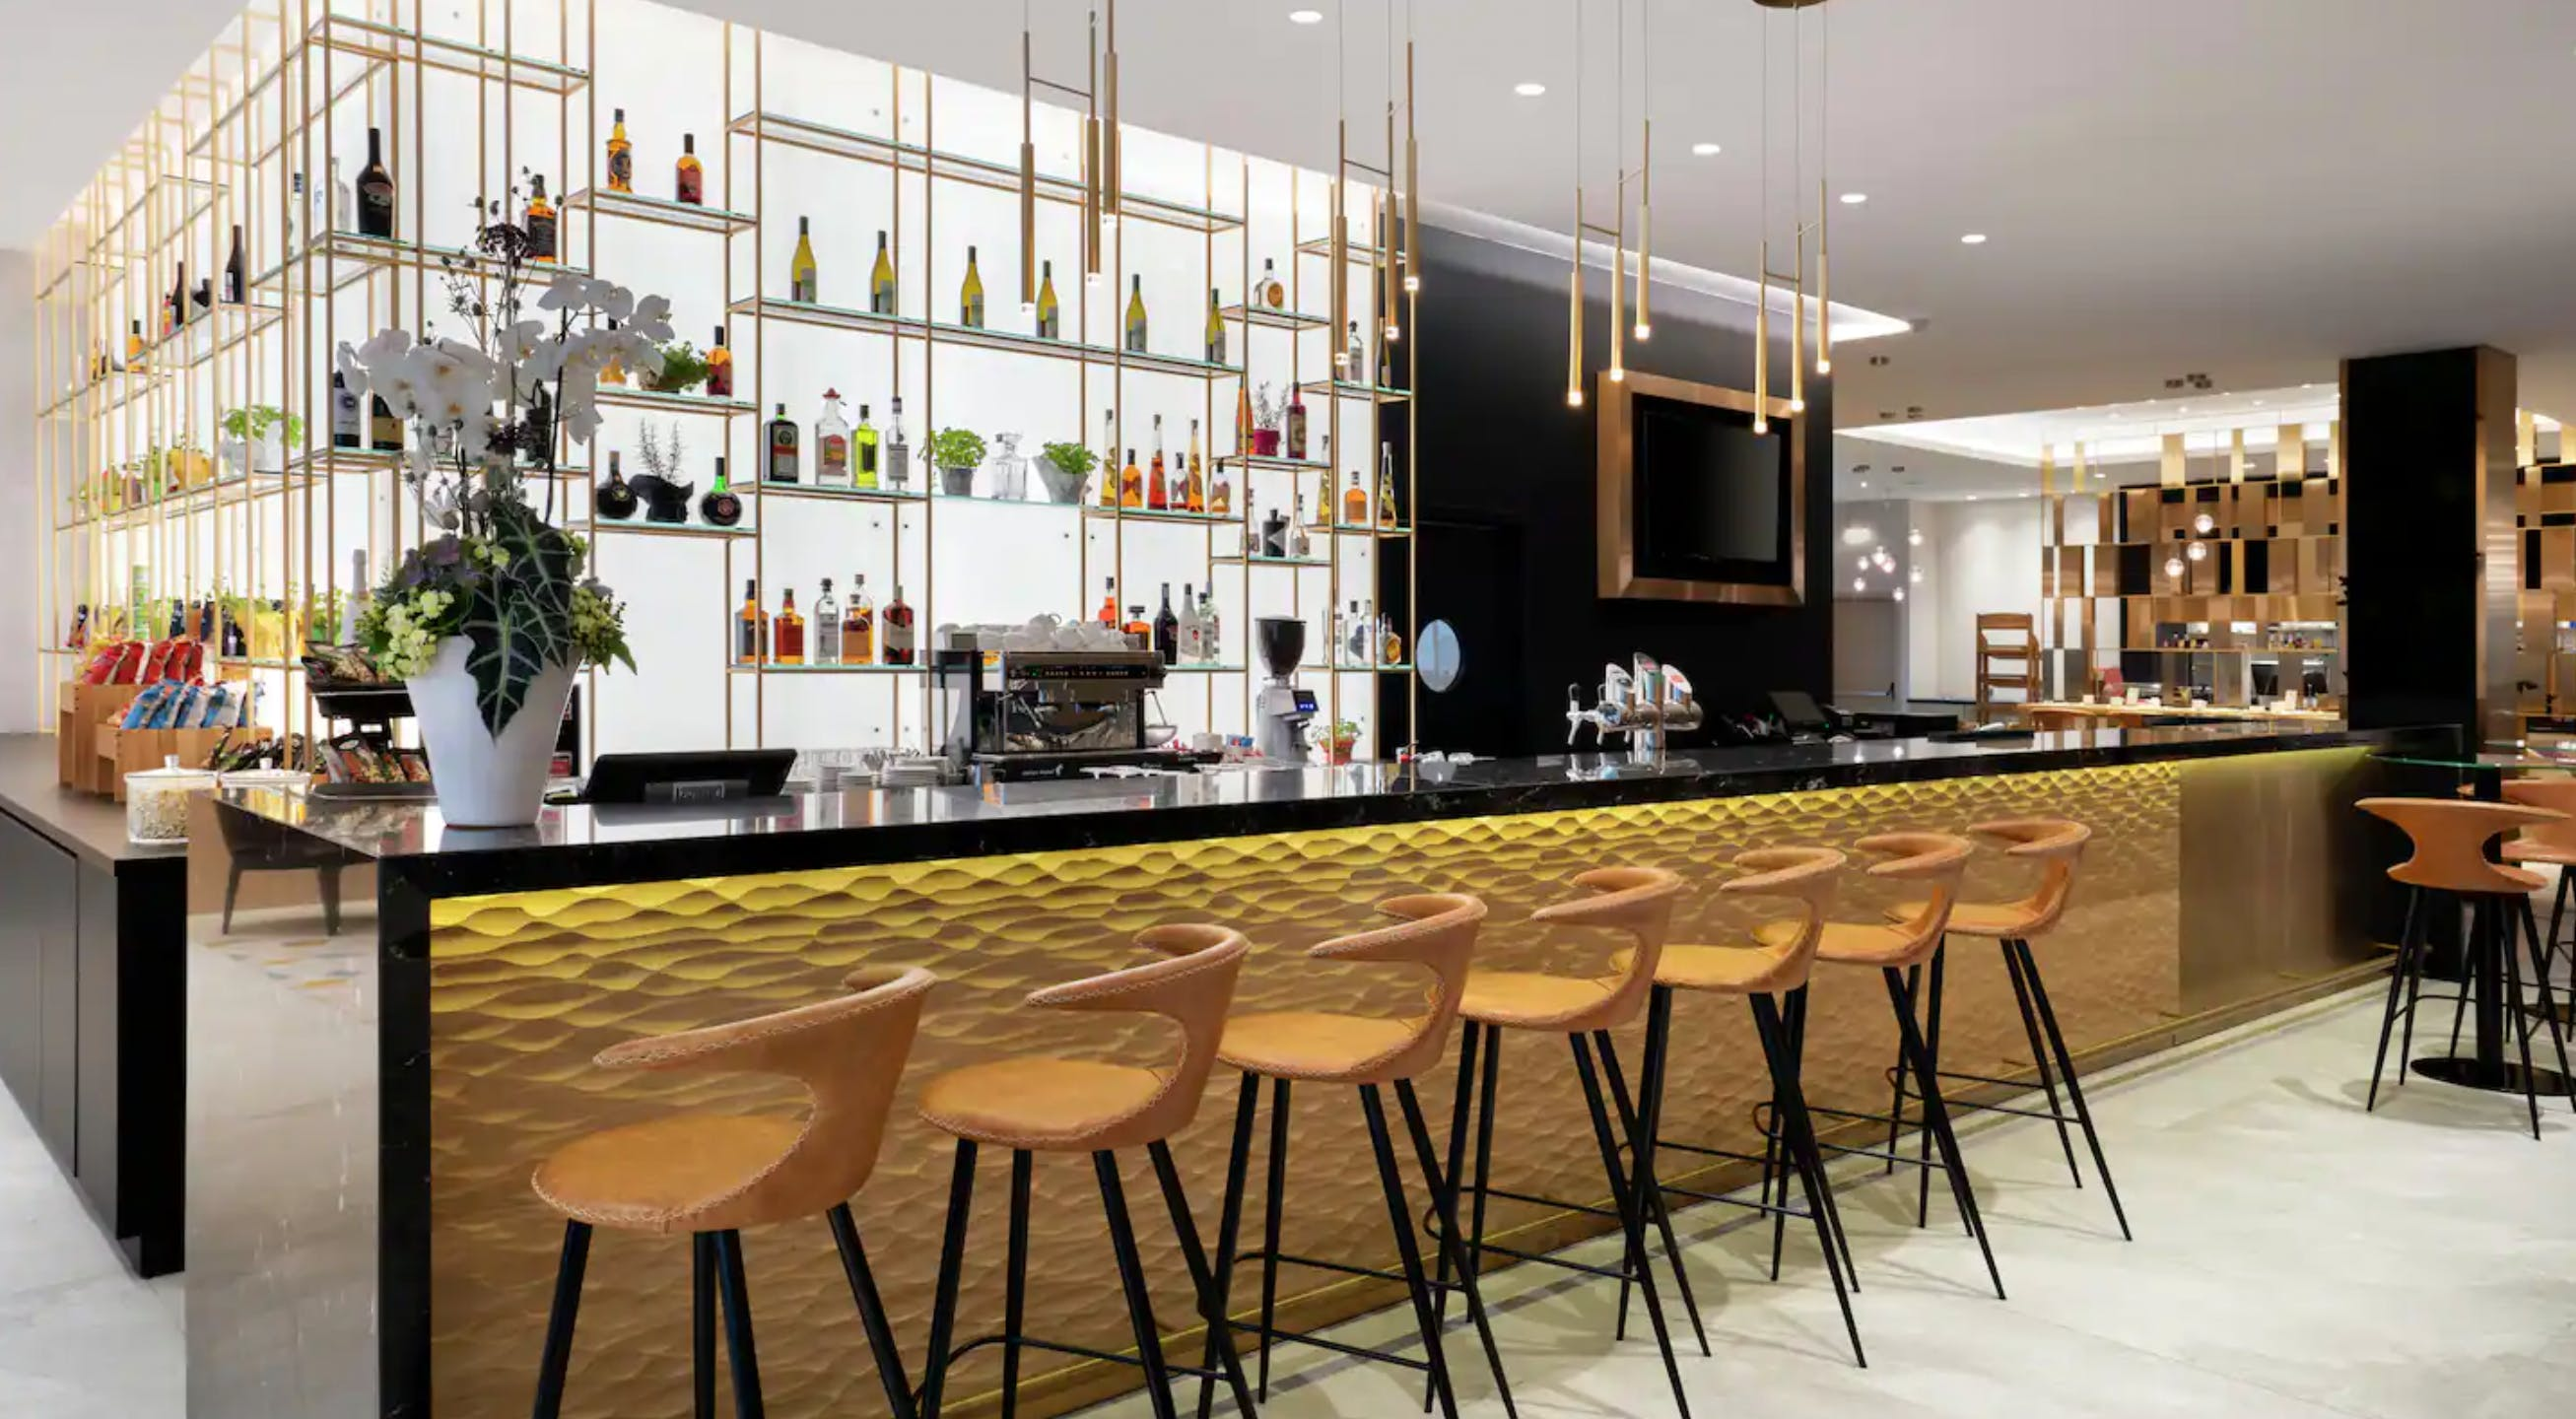 Hilton Garden Inn Budapest City Centre bar